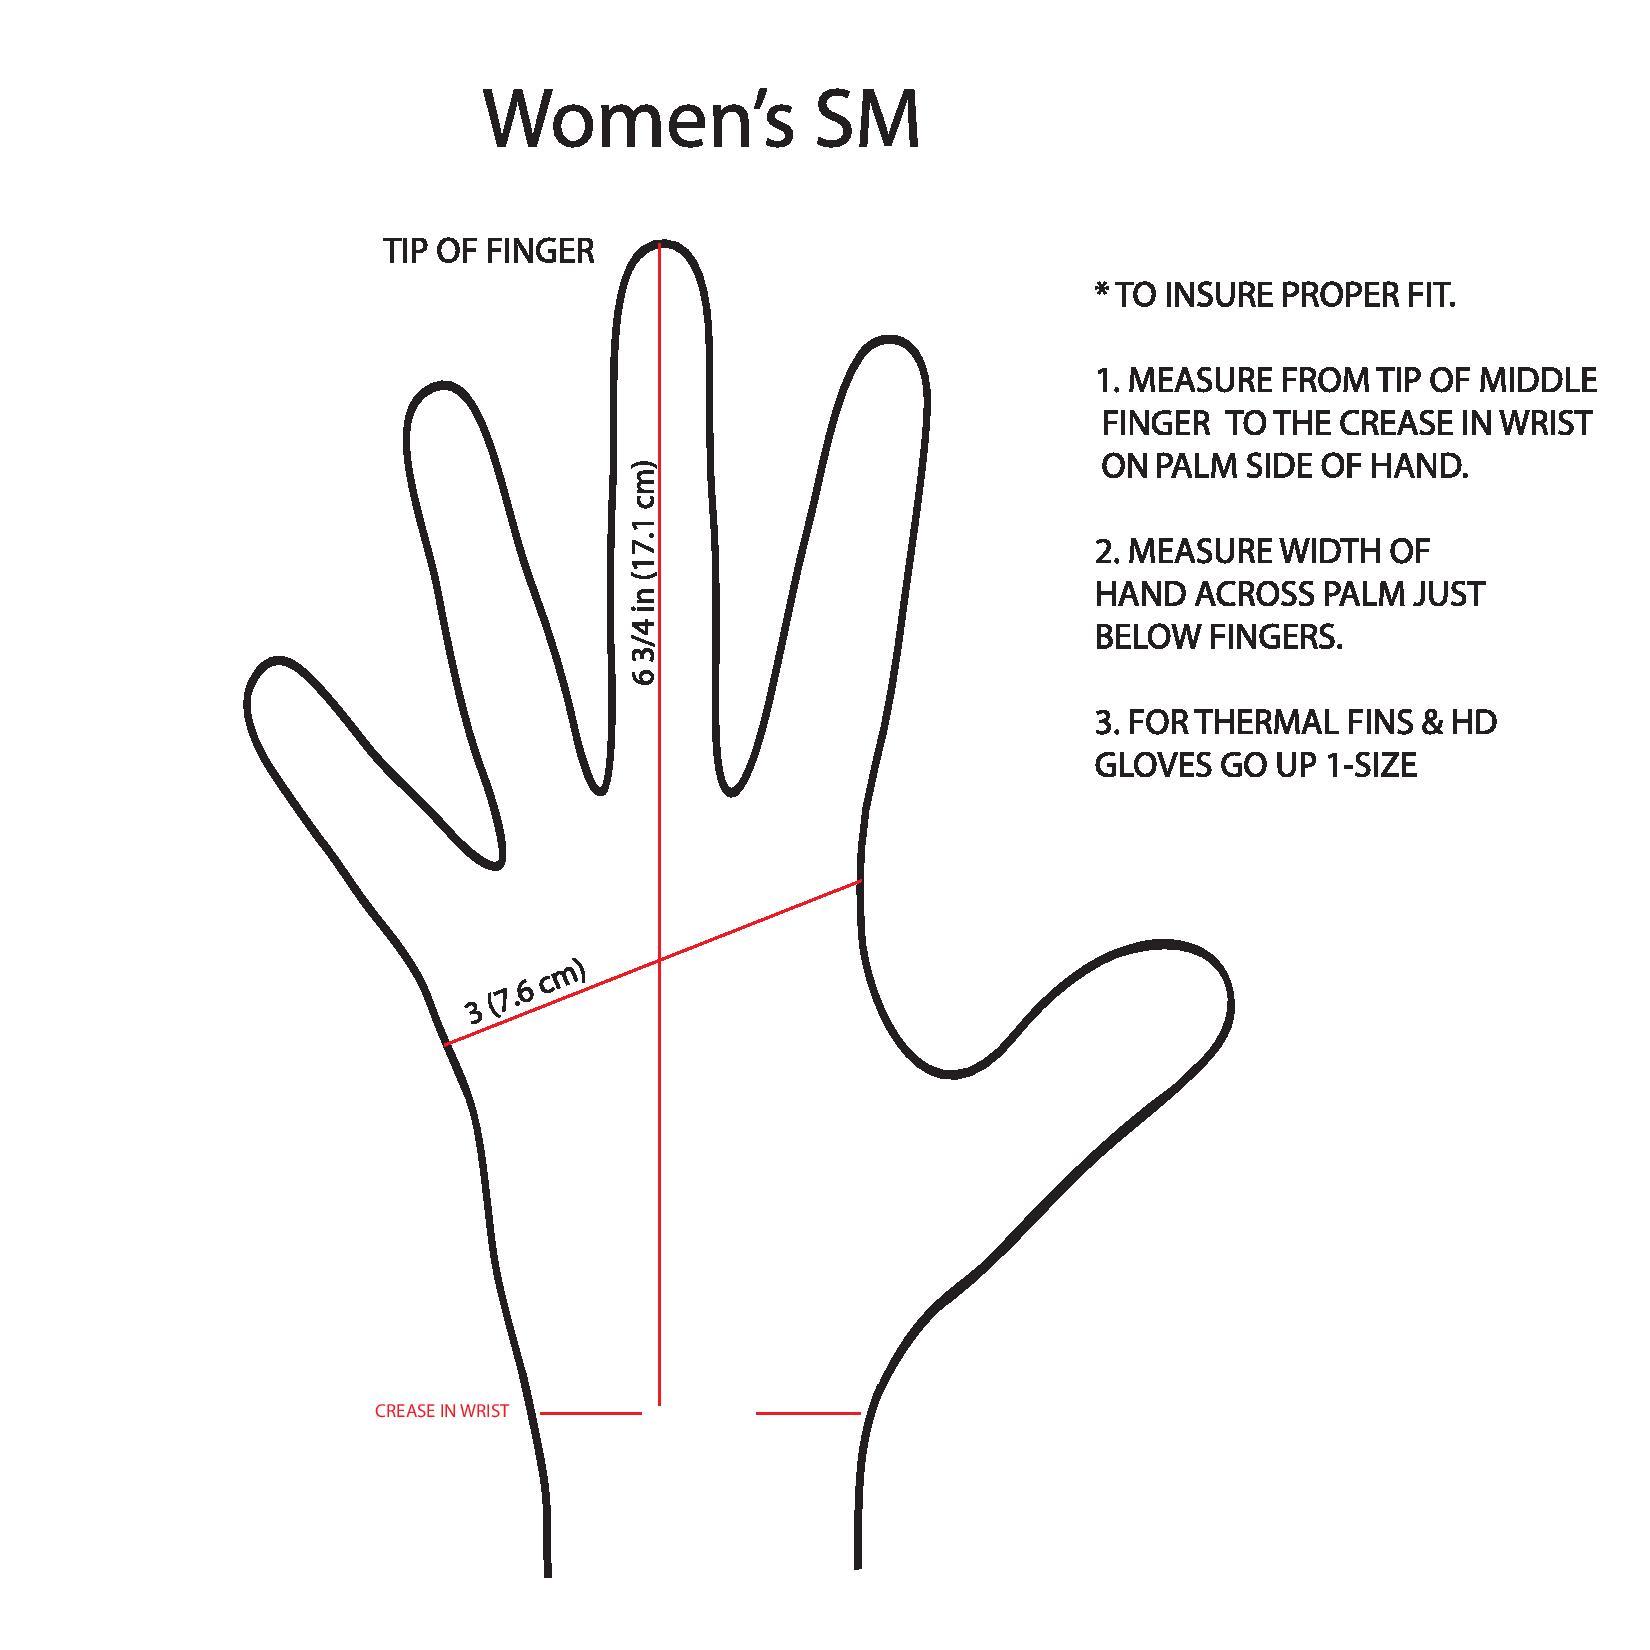 women-s-sm-page-001-2-.jpg